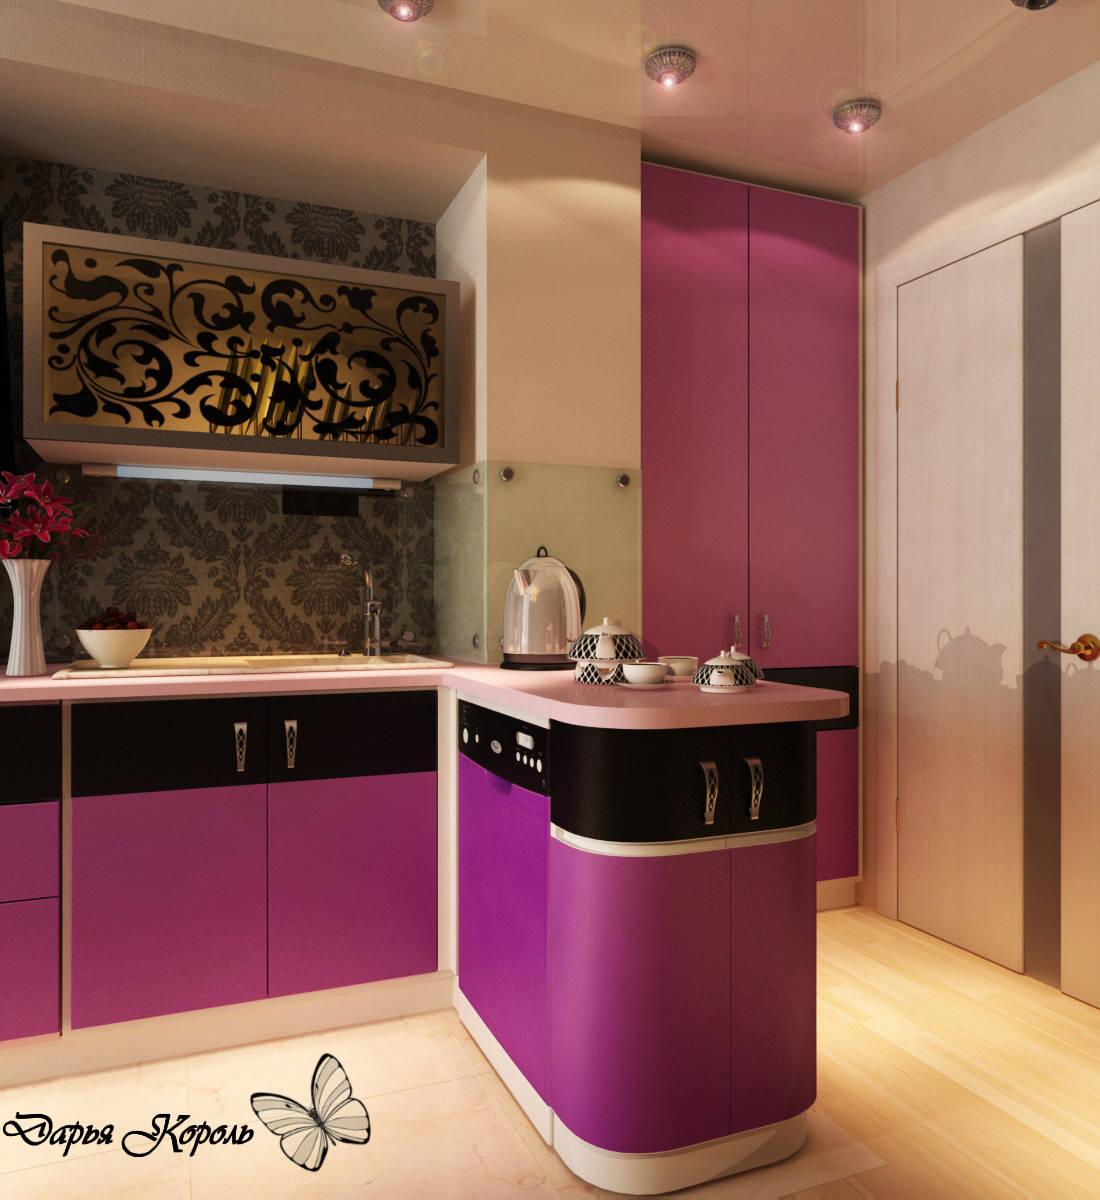 Кухня для бизнес-леди